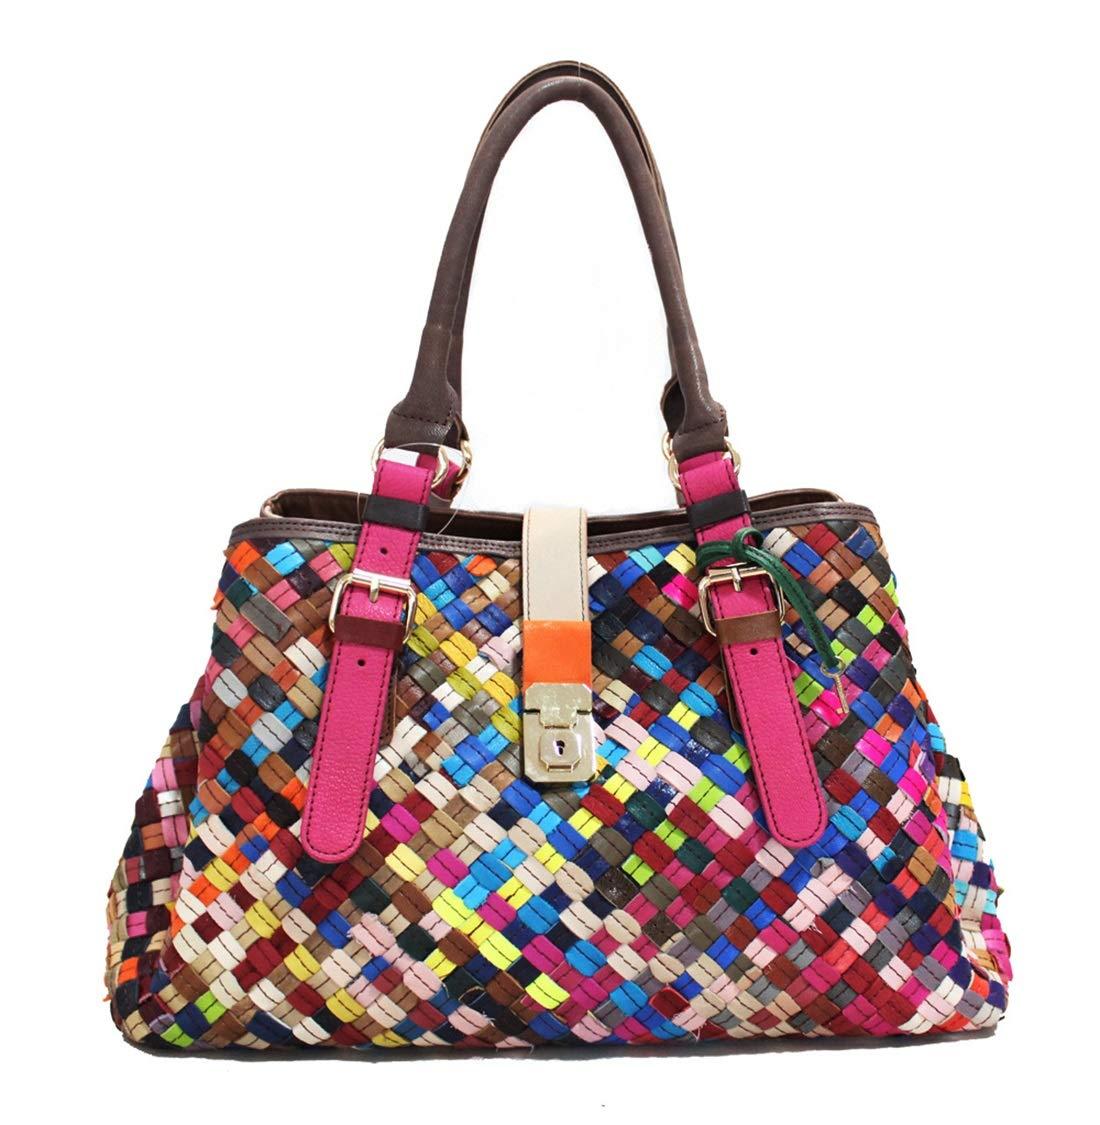 LilyAngel 本革 パッチワーク ハンドバッグ トットバッグ 旅行バック 鞄 本羊革 カラーフリー レディース メンズ 収納 大容量 (Color : Colour) B07KQSLBV9 Colour